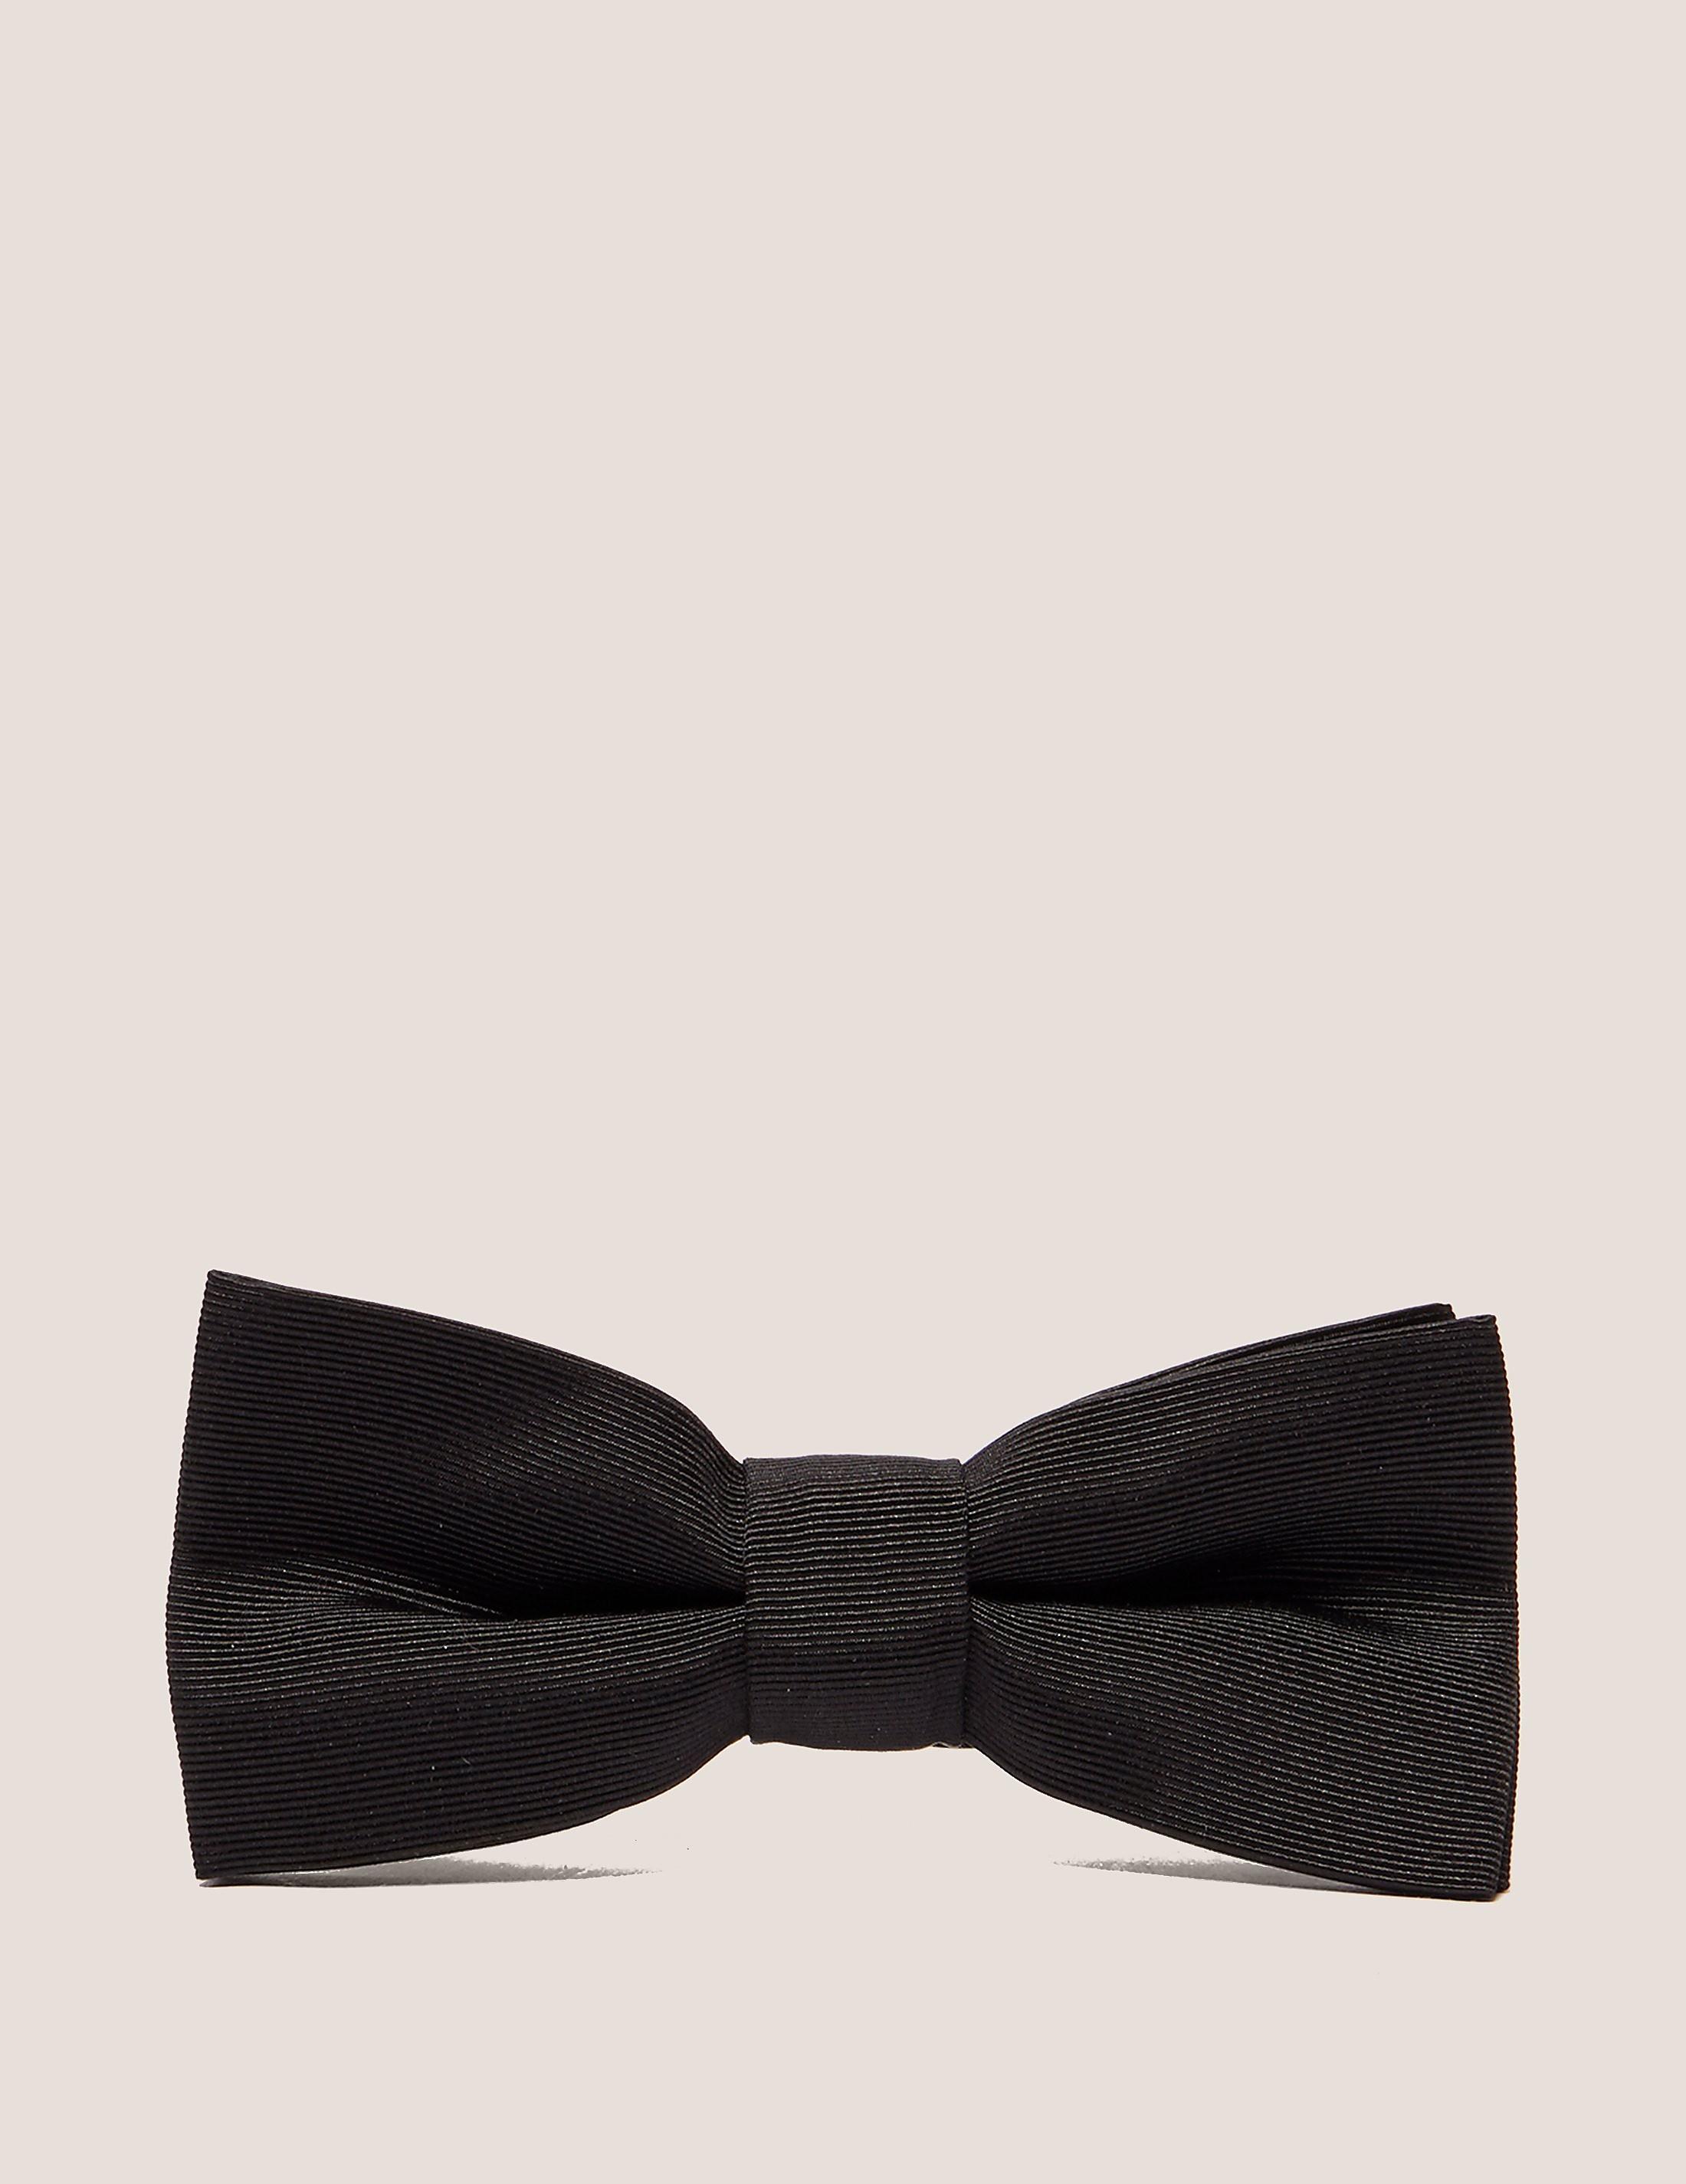 DSQUARED2 Classic Bow Tie